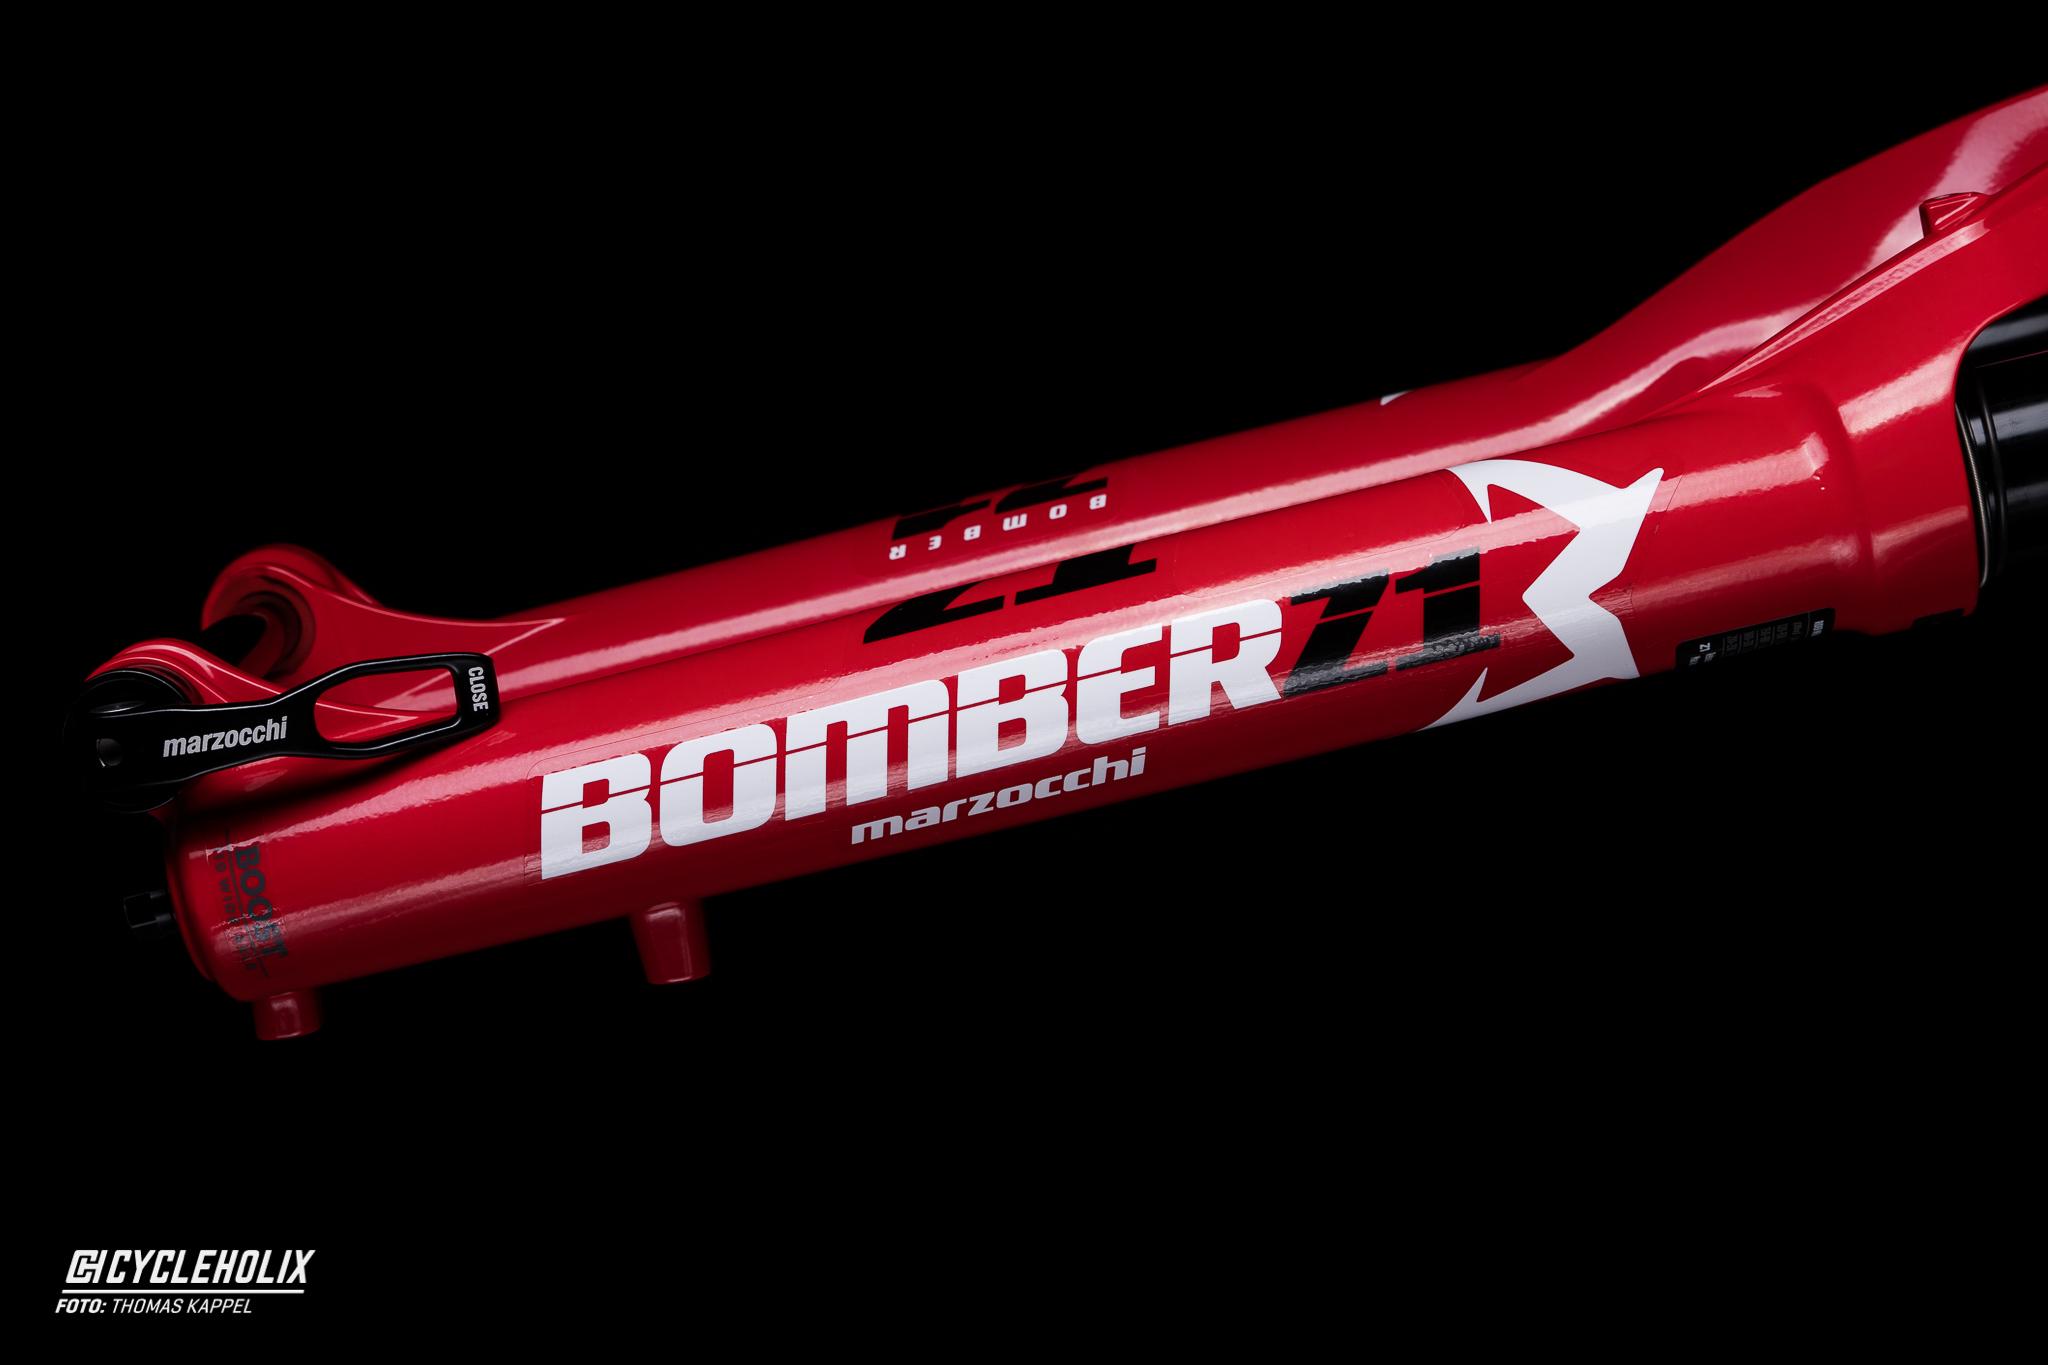 Marzocchi Bomber Z1 2020